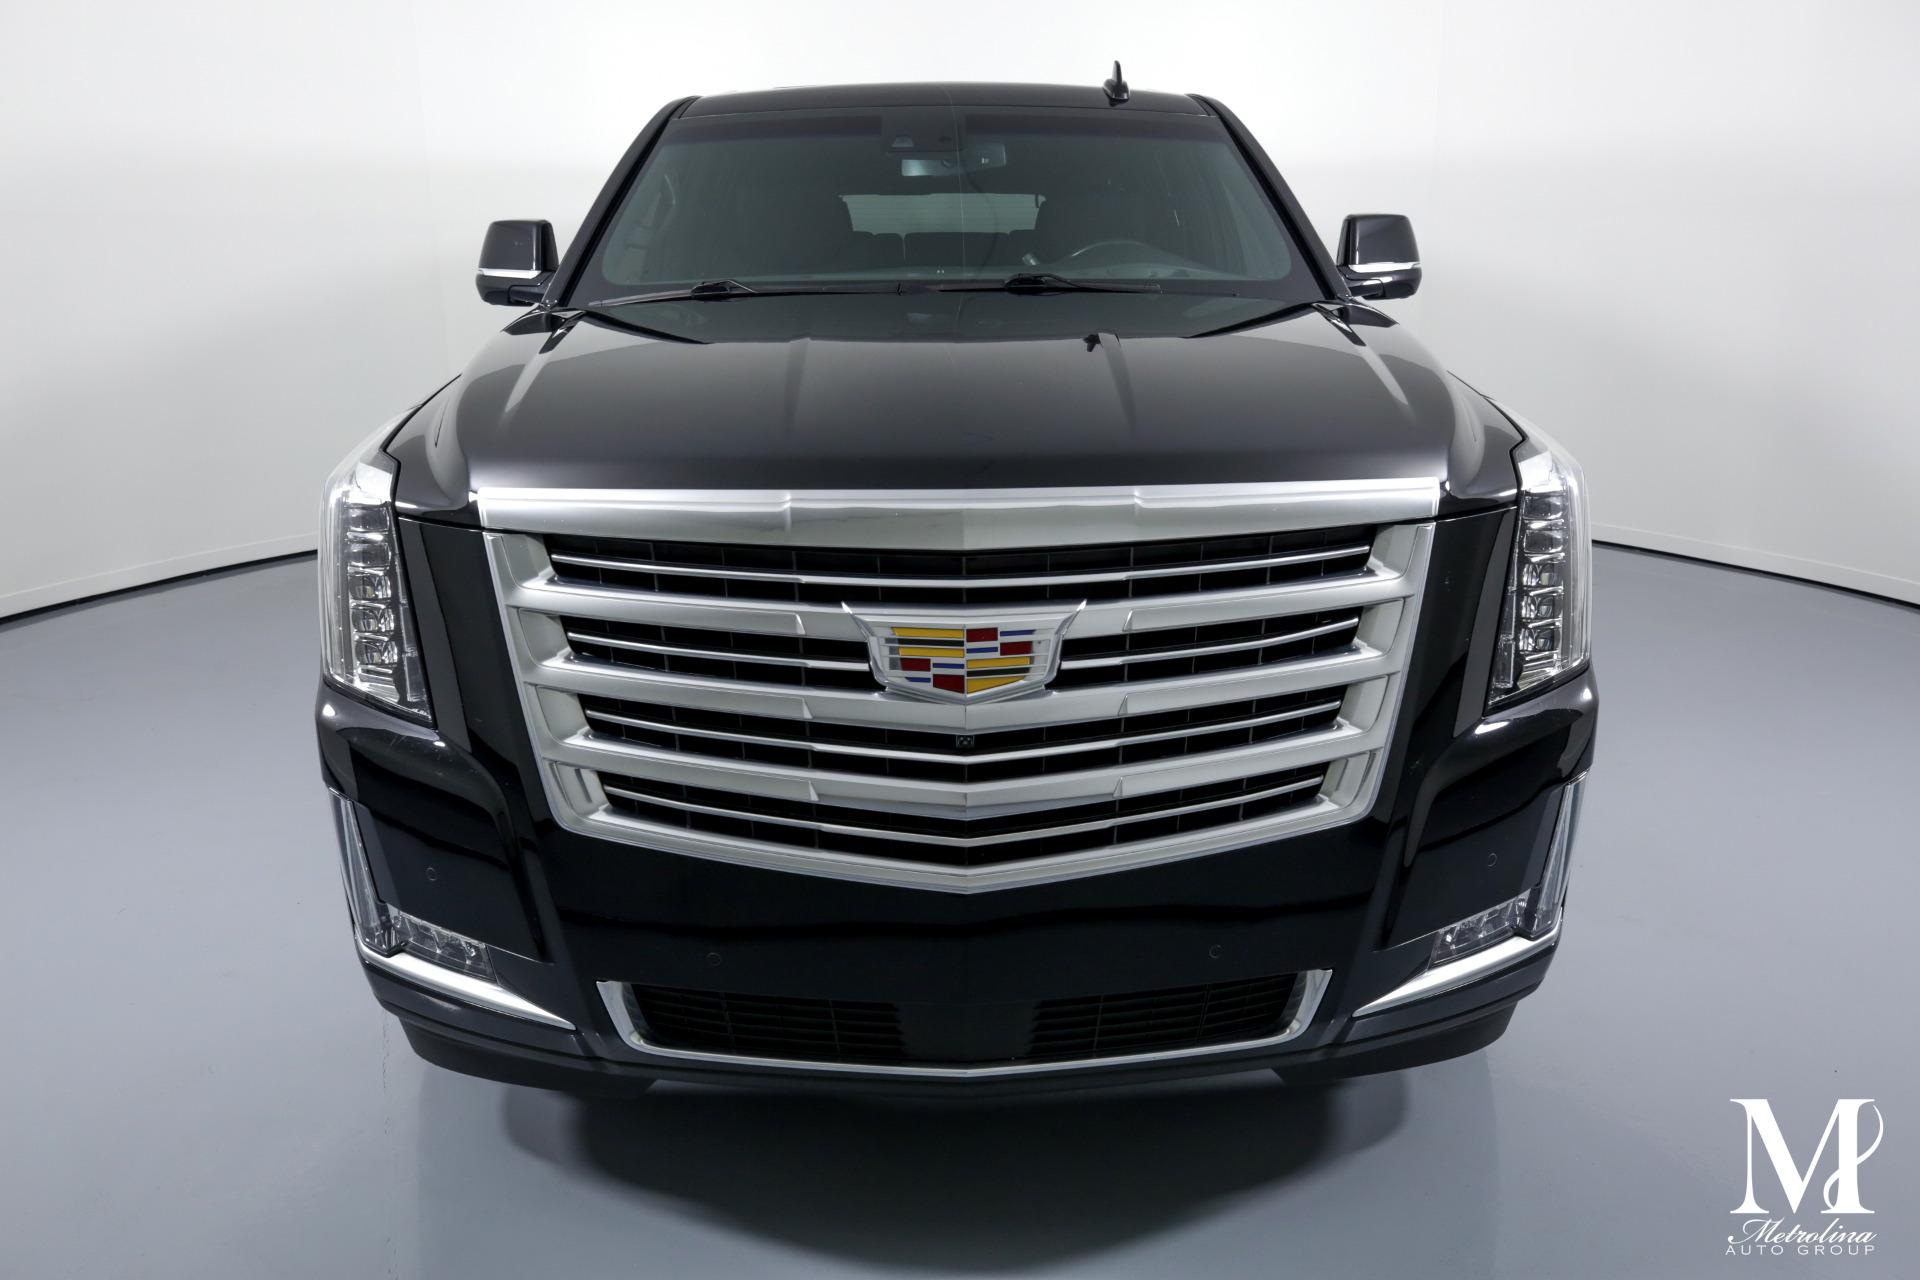 Used 2016 Cadillac Escalade ESV Platinum for sale $54,996 at Metrolina Auto Group in Charlotte NC 28217 - 3